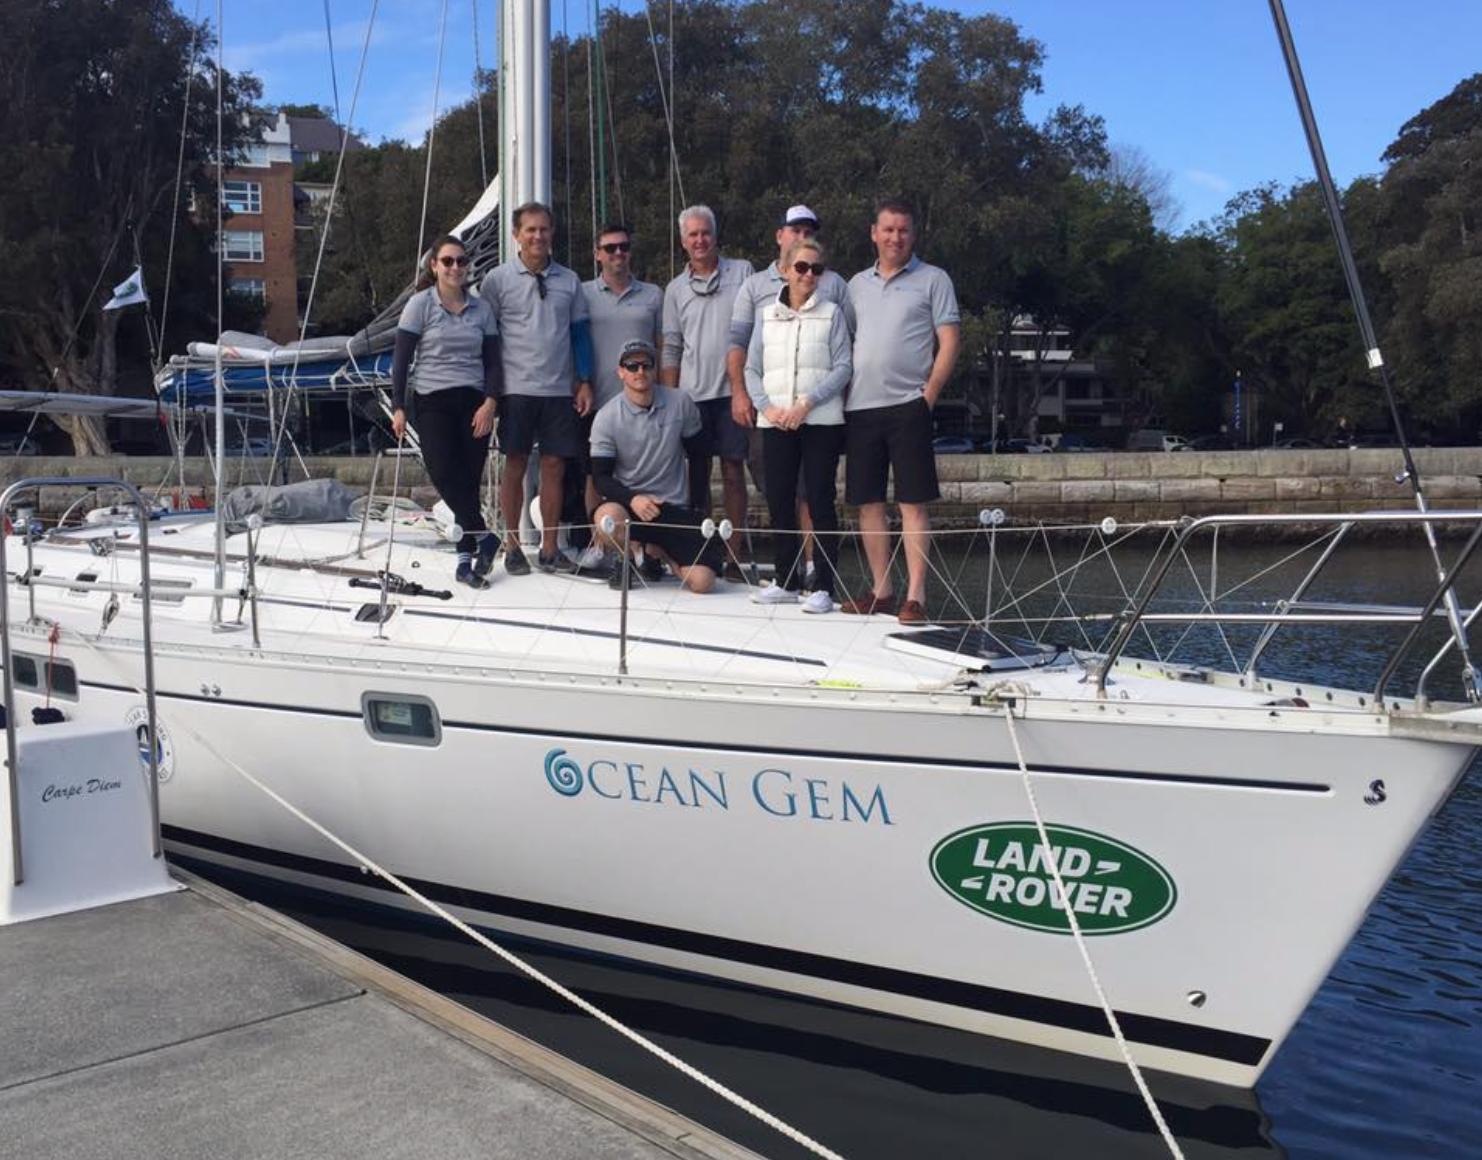 Sydney Hobart Race 2017 - Gold Coast City Marina